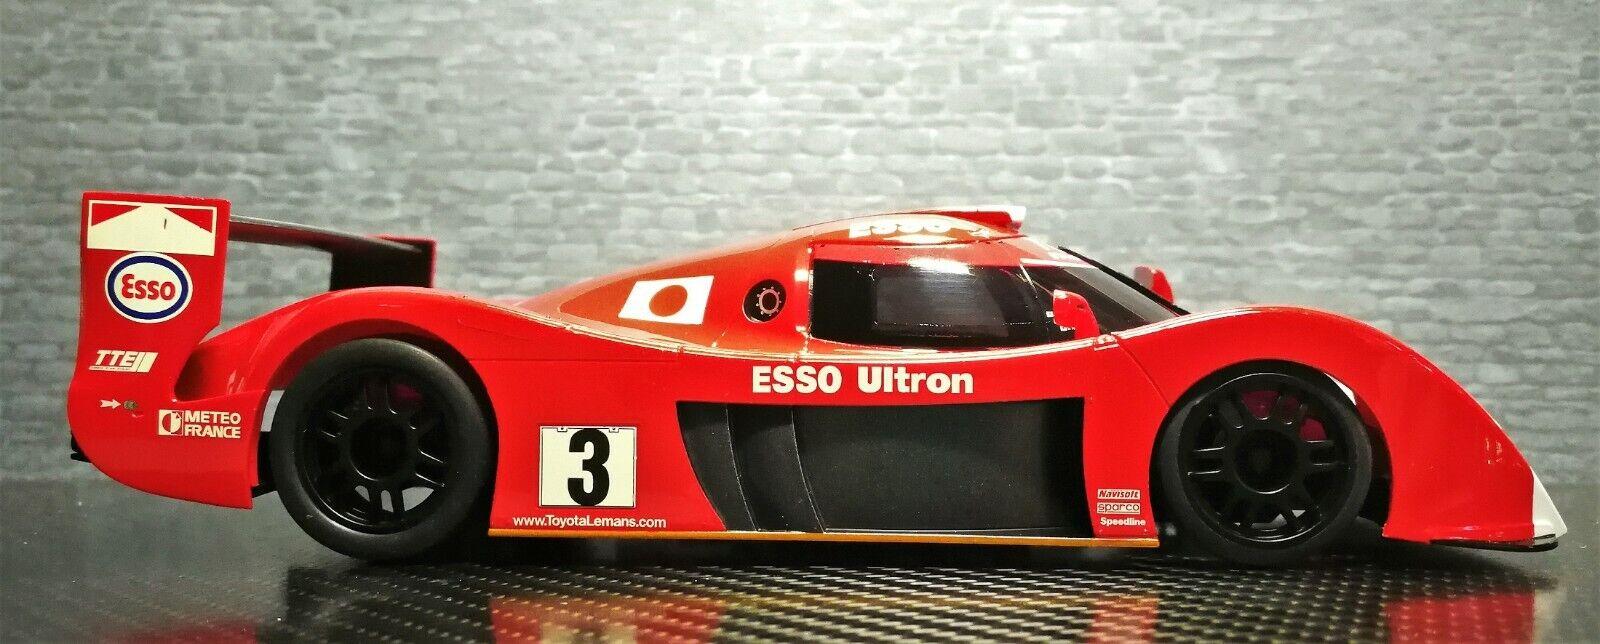 Jugueteota GT-One ts020 nº 3 LM Kyosho mini-z body para RWD mr03 (W-LM) + caja de presentación